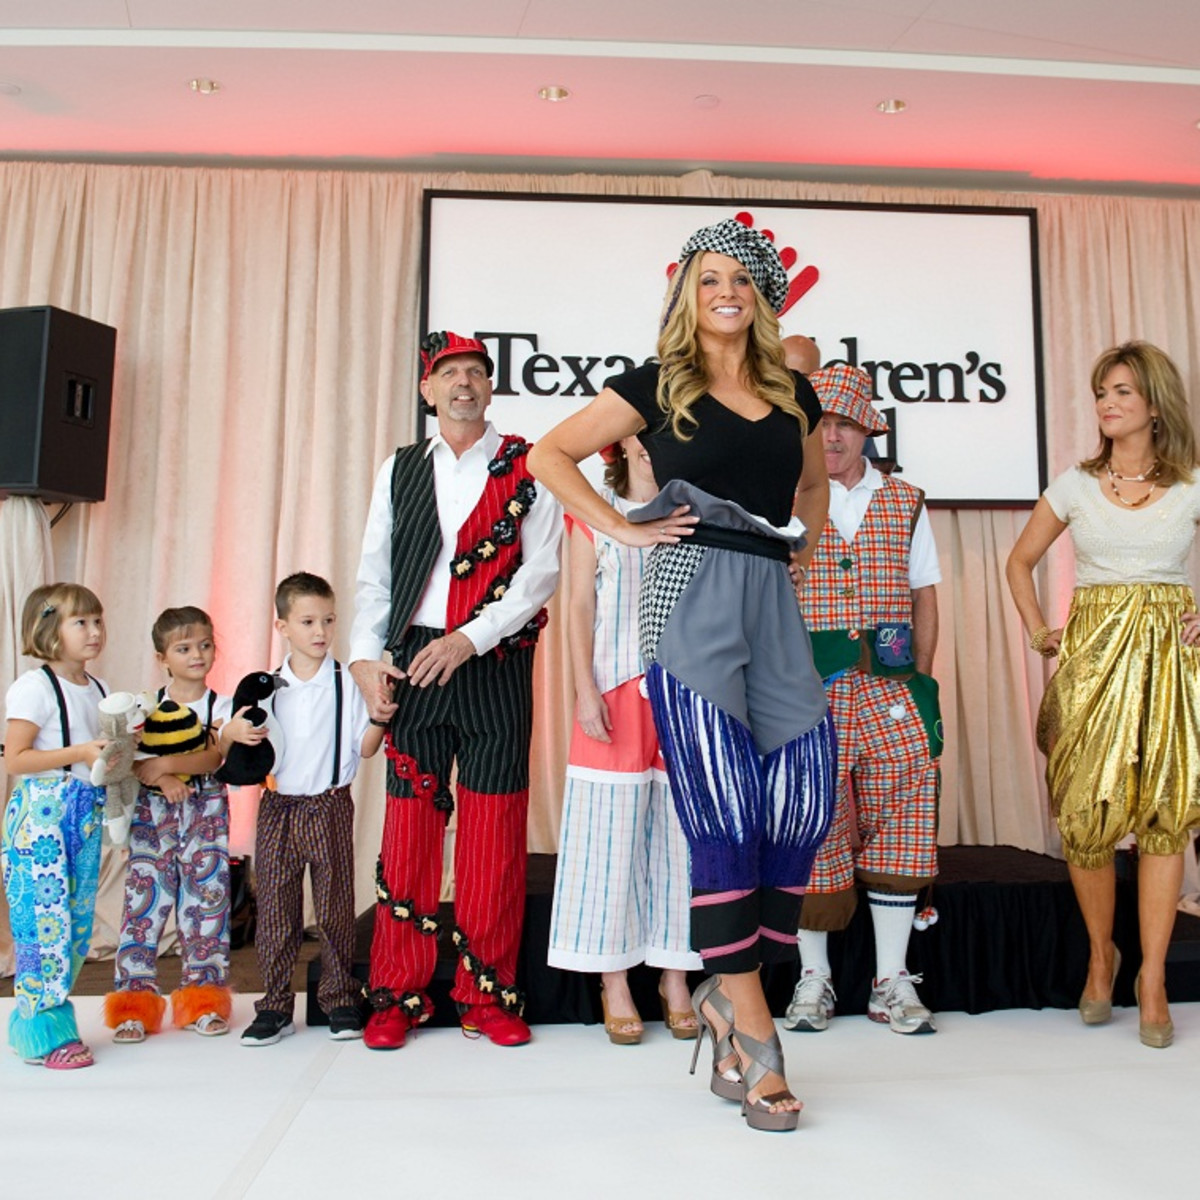 Bad Pants Fashion Show, Chita Johnson, Texas Children's Hospital, August 2012